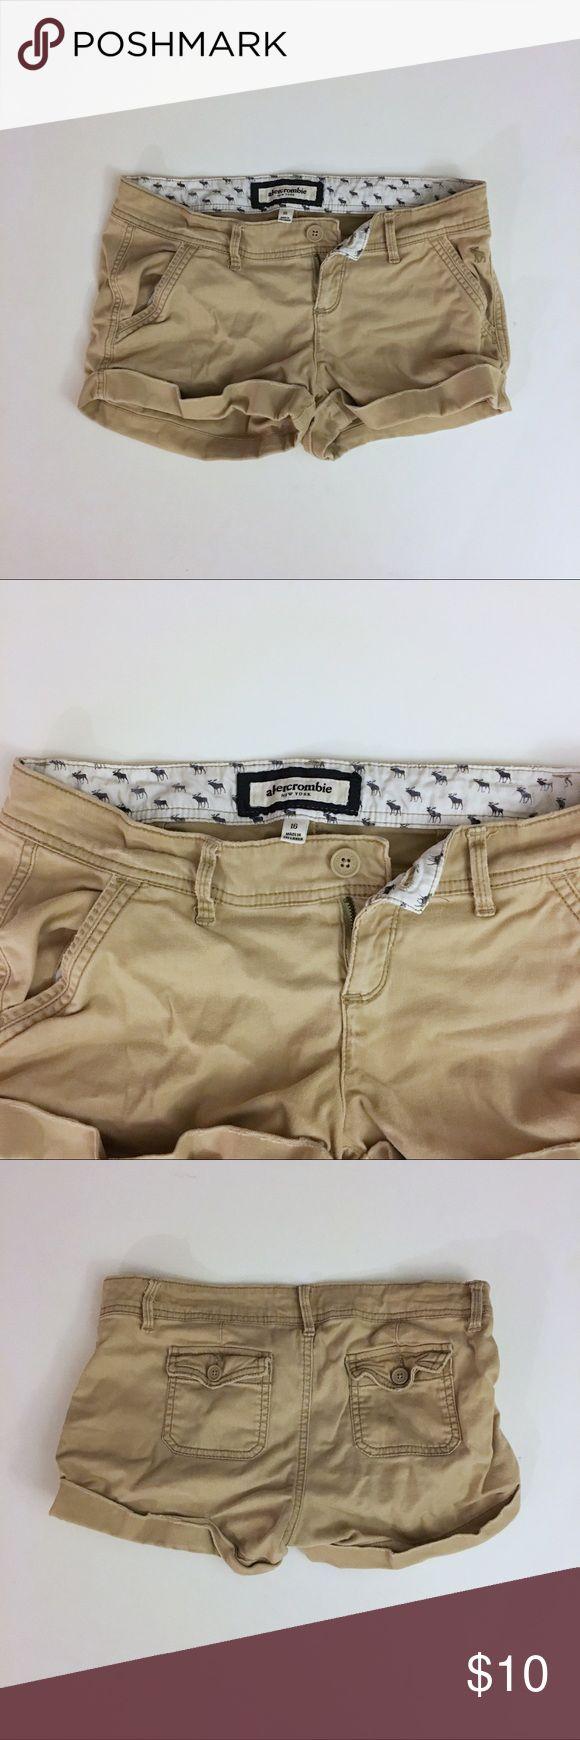 Abercrombie Kids Girl's Khaki Shorts - Size 16 Abercrombie Kids Girl's Khaki Shorts - Size 16 - in good condition Abercombie Kids Bottoms Shorts